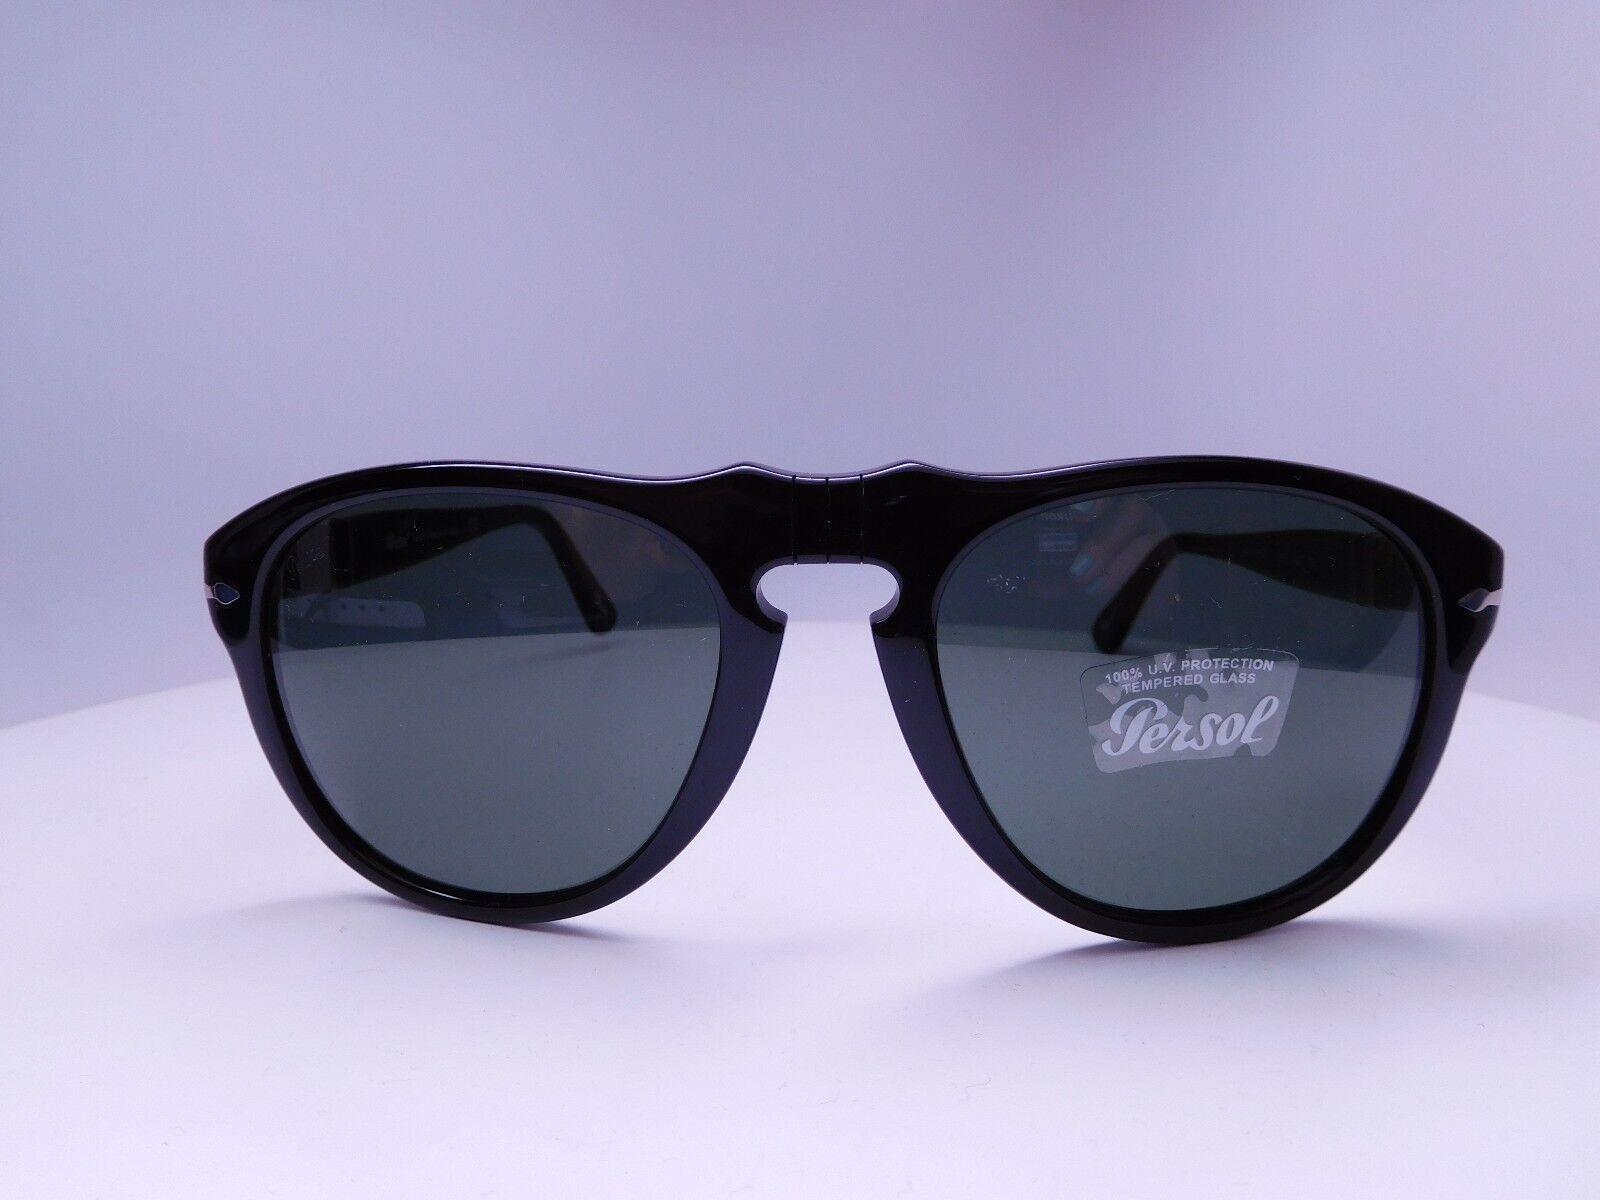 d10d3fc216 Authentic Persol 649 95 31 Black Aviator Sunglasses 54mm